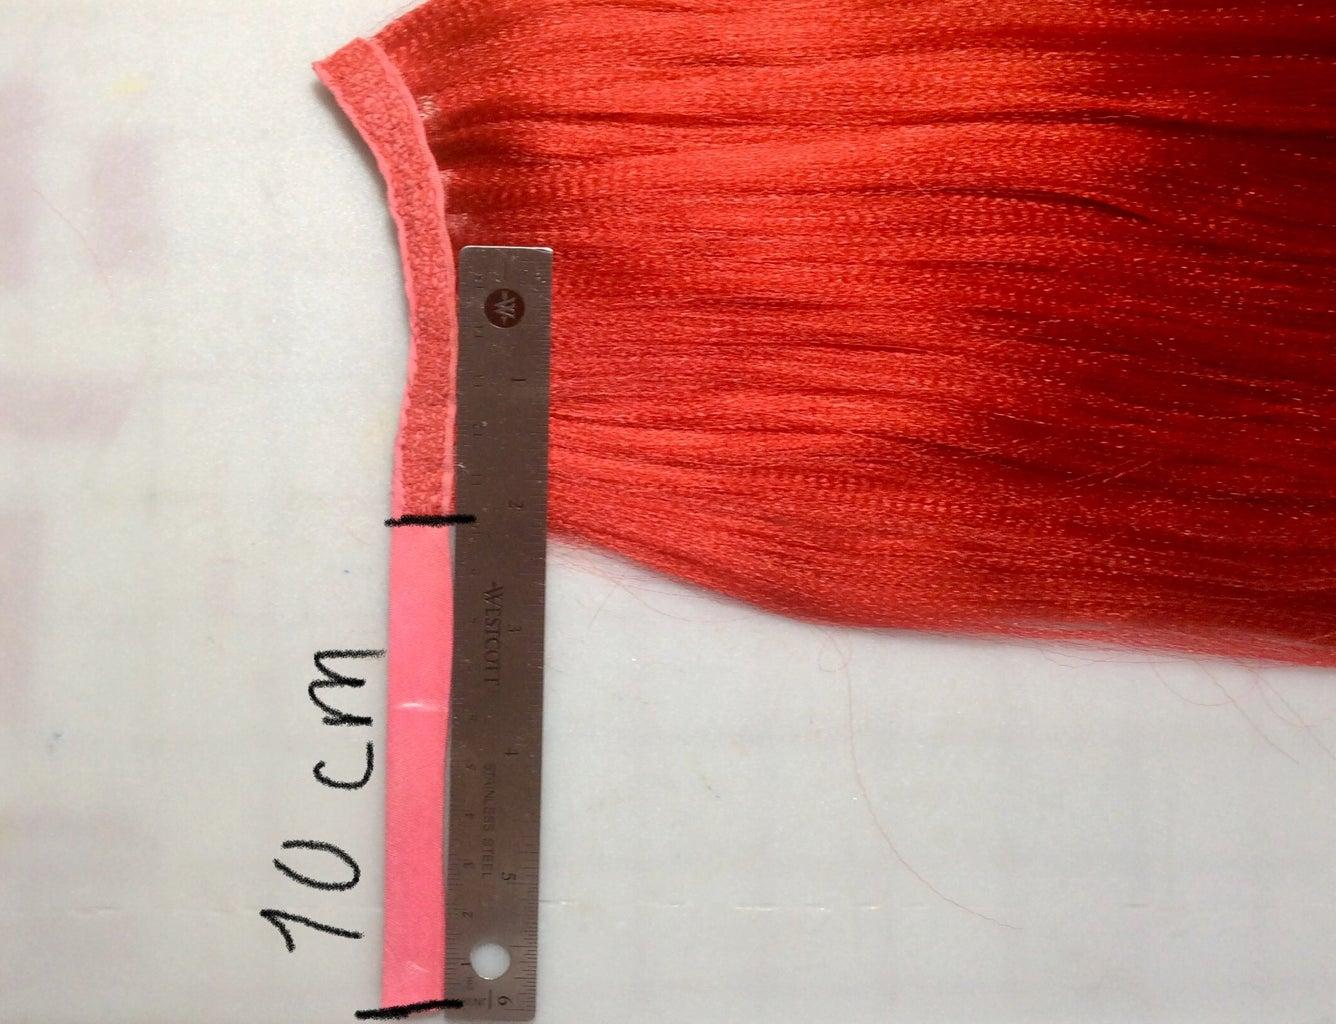 Sewing on the Wrap Around Segment